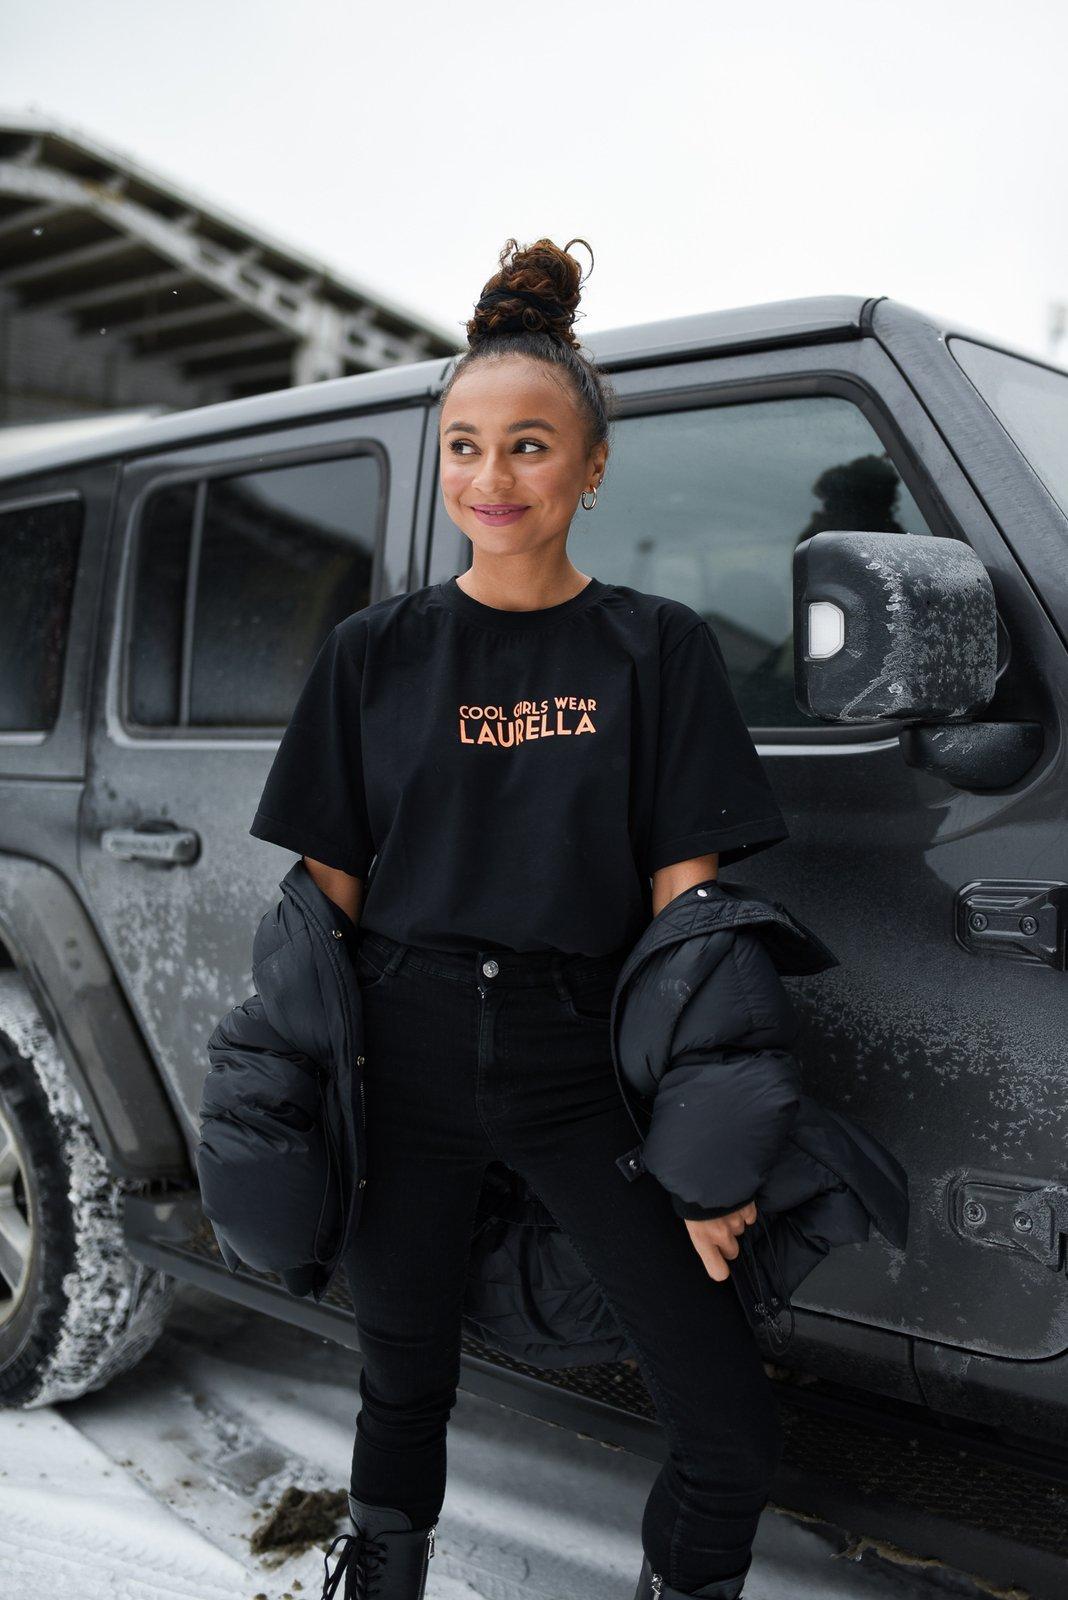 CHEAP Noel Black T-shirt 28617024053 – Women's Tops